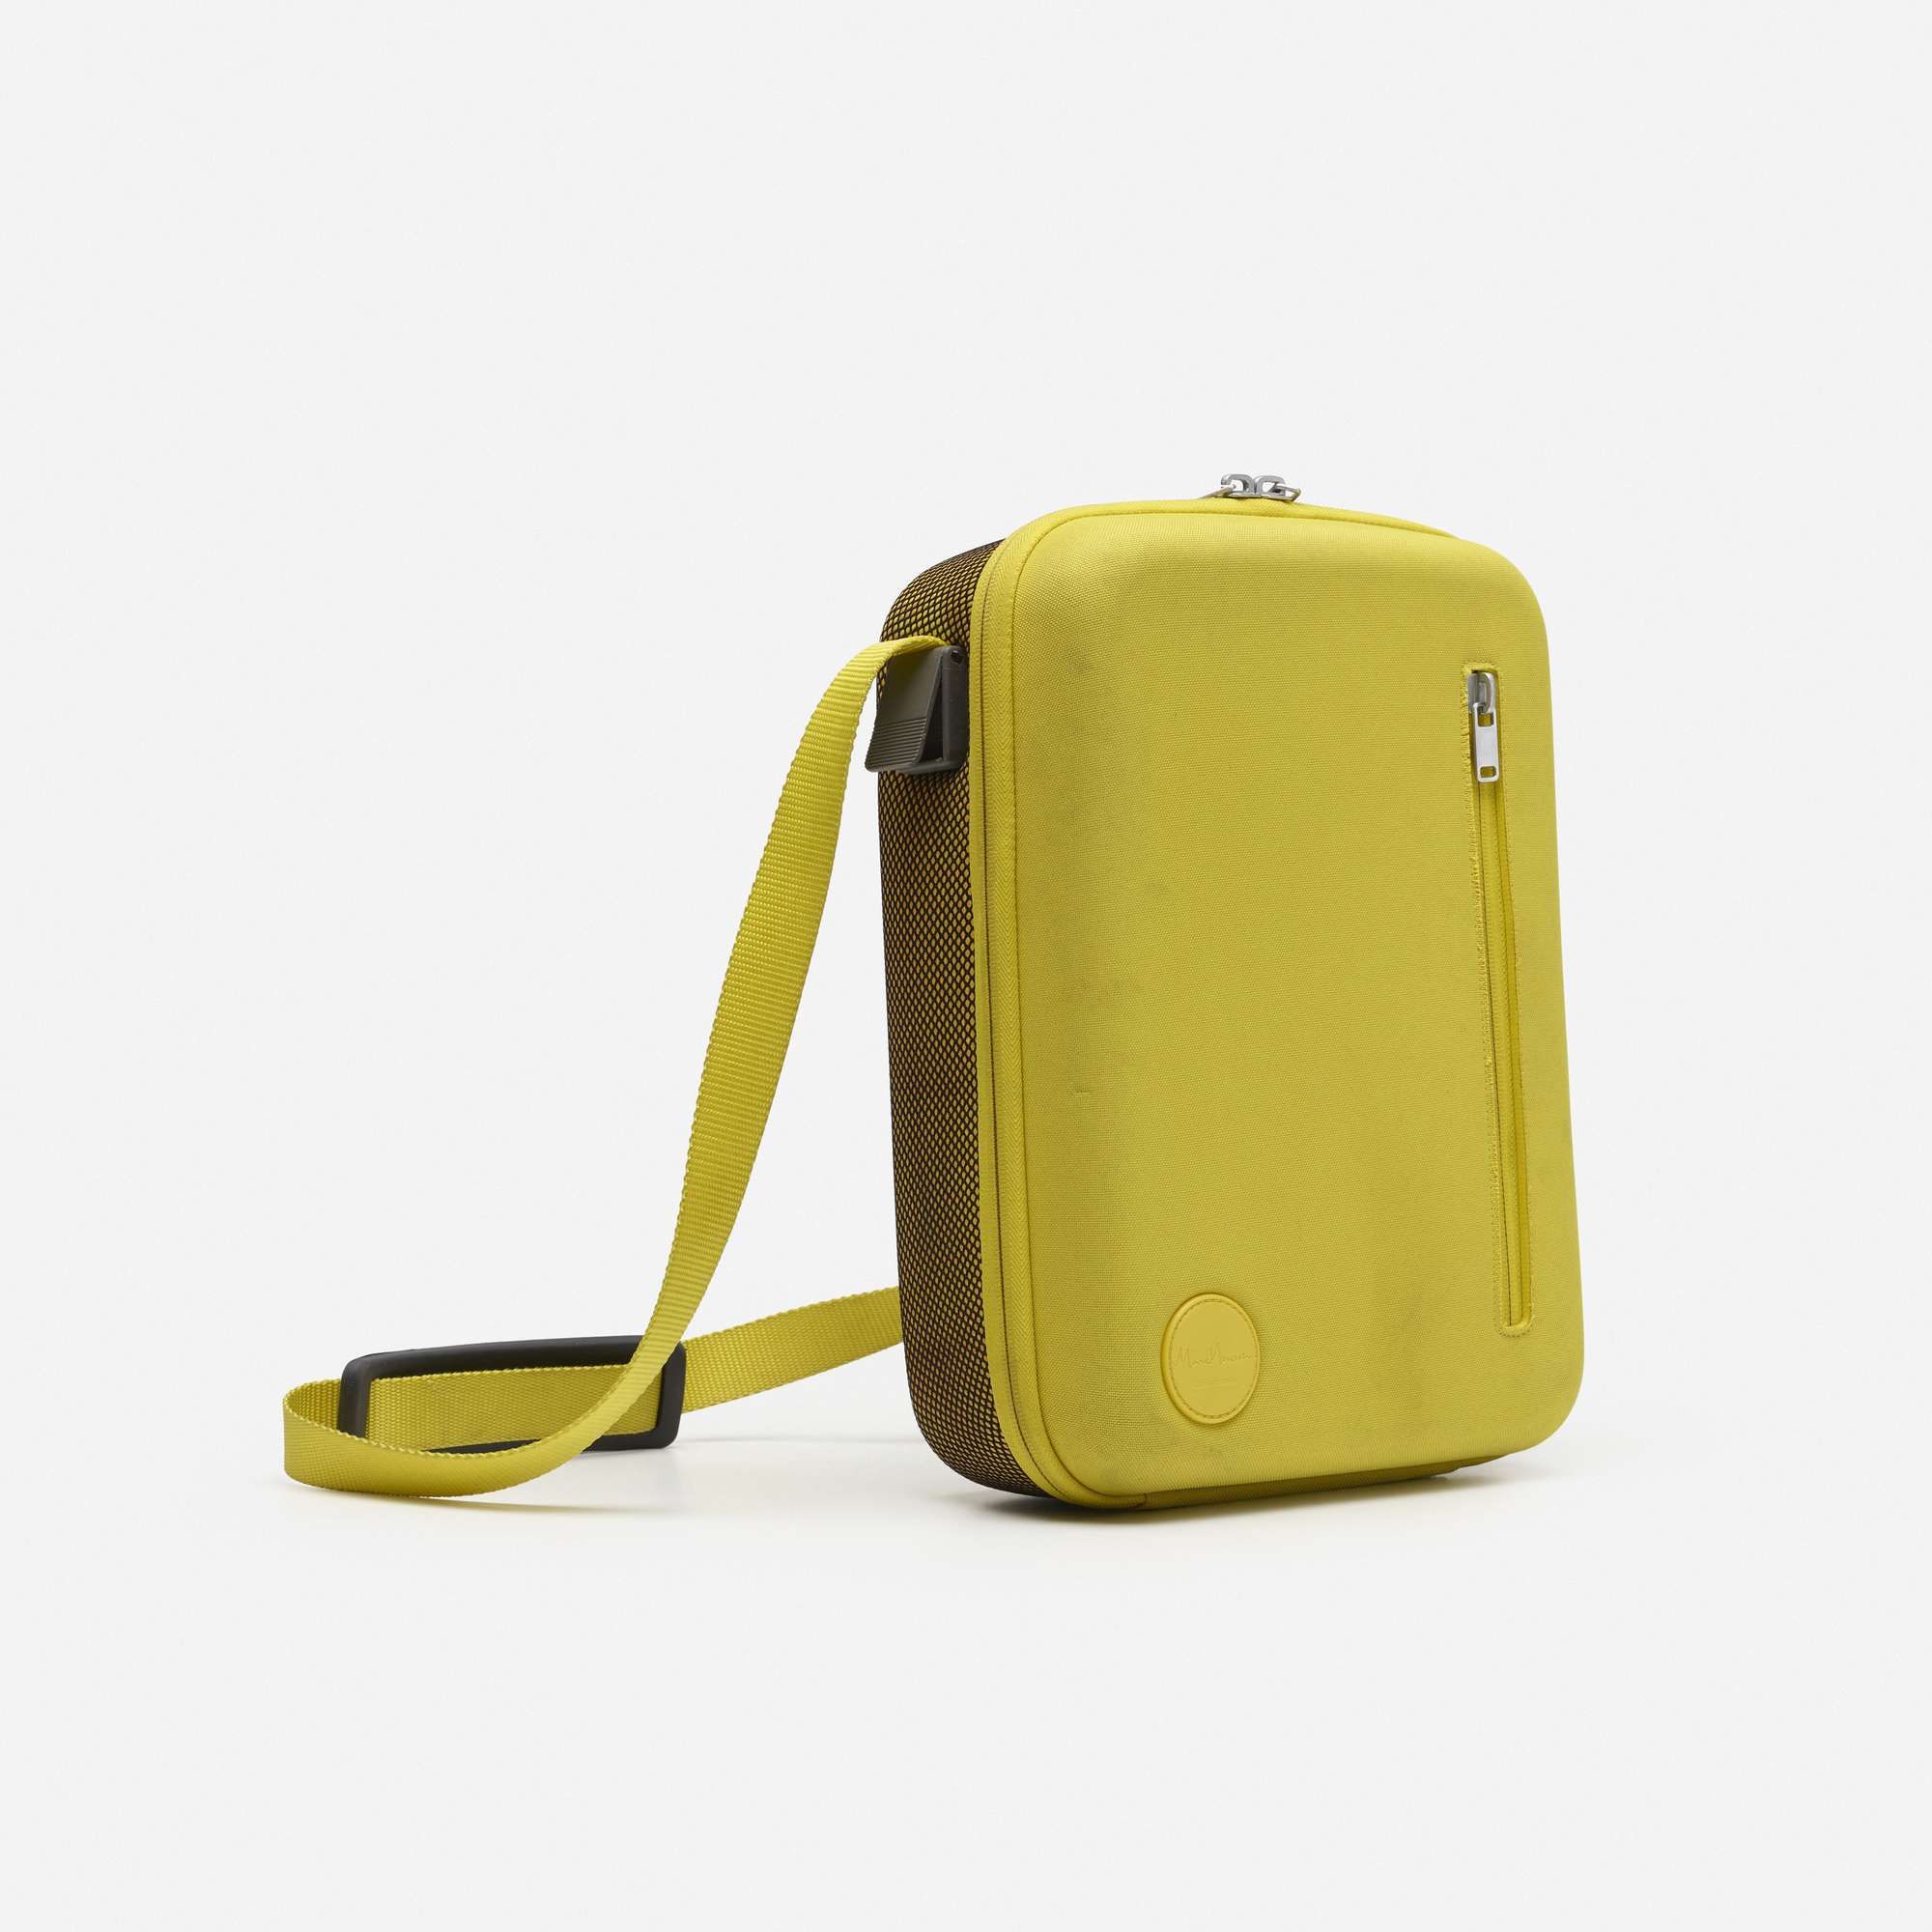 639: Marc Newson / Scope bag (1 of 1)